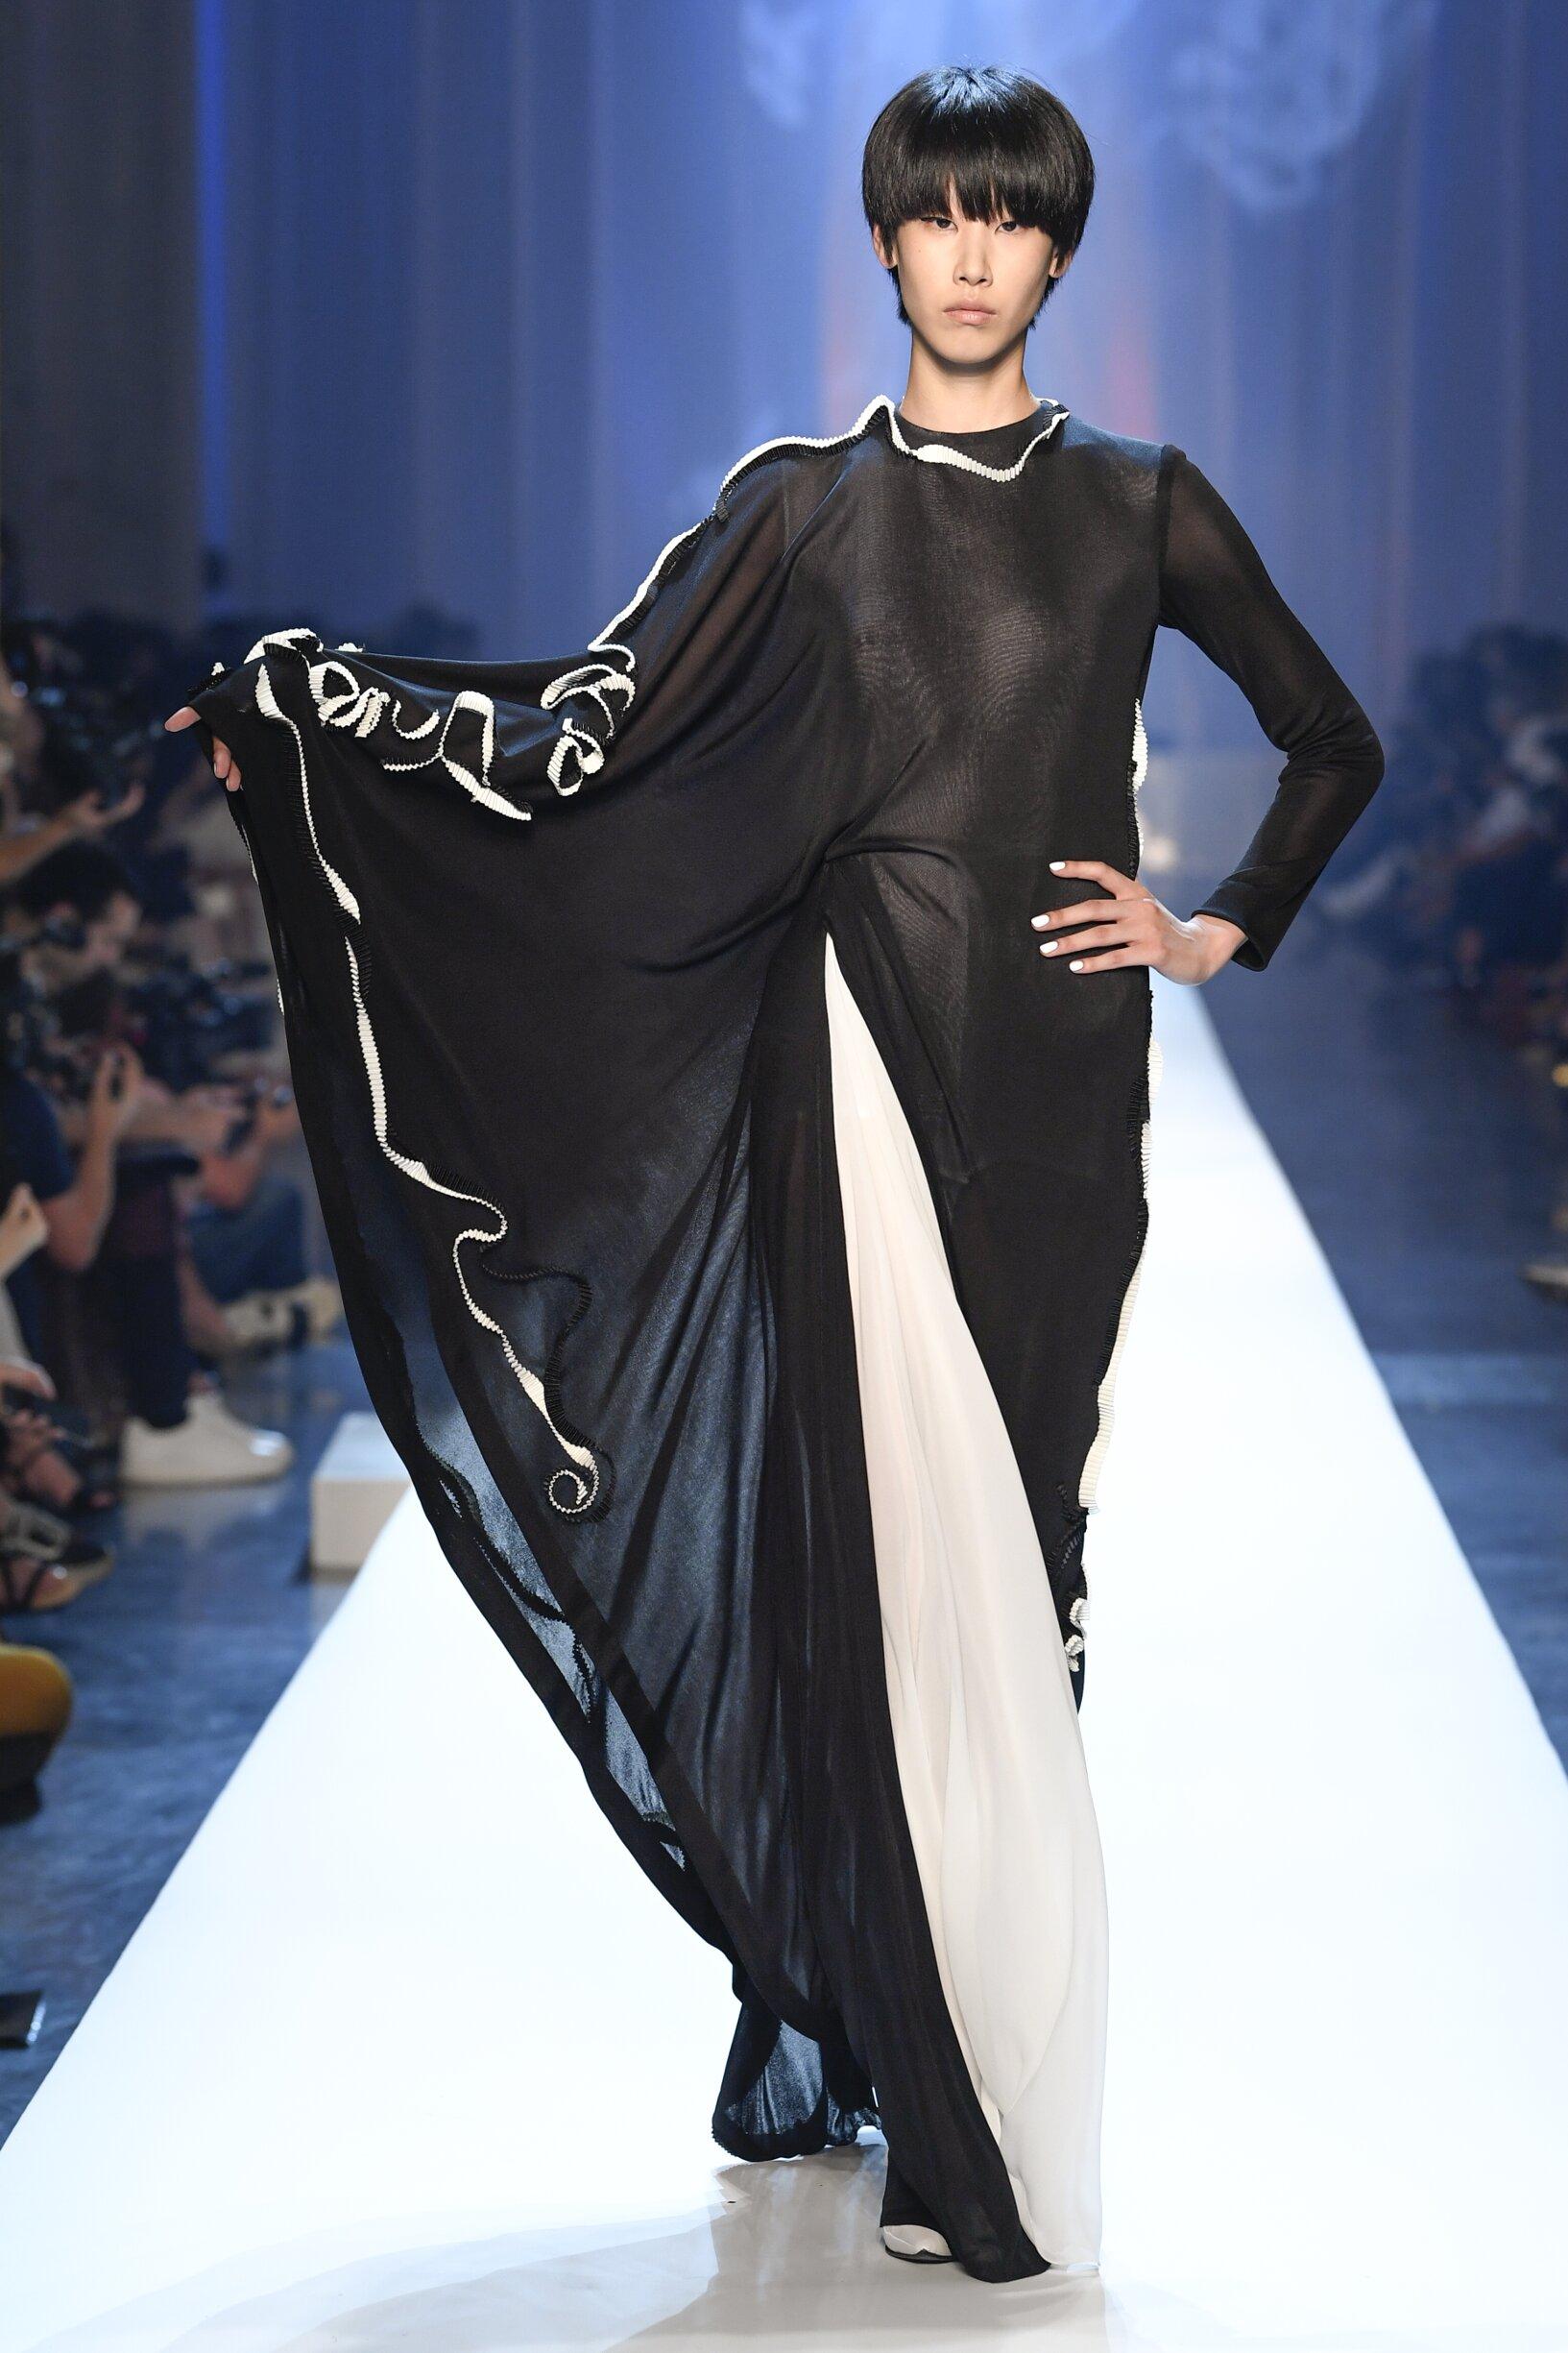 Jean-Paul Gaultier Haute Couture 2018 Paris Trends Womenswear